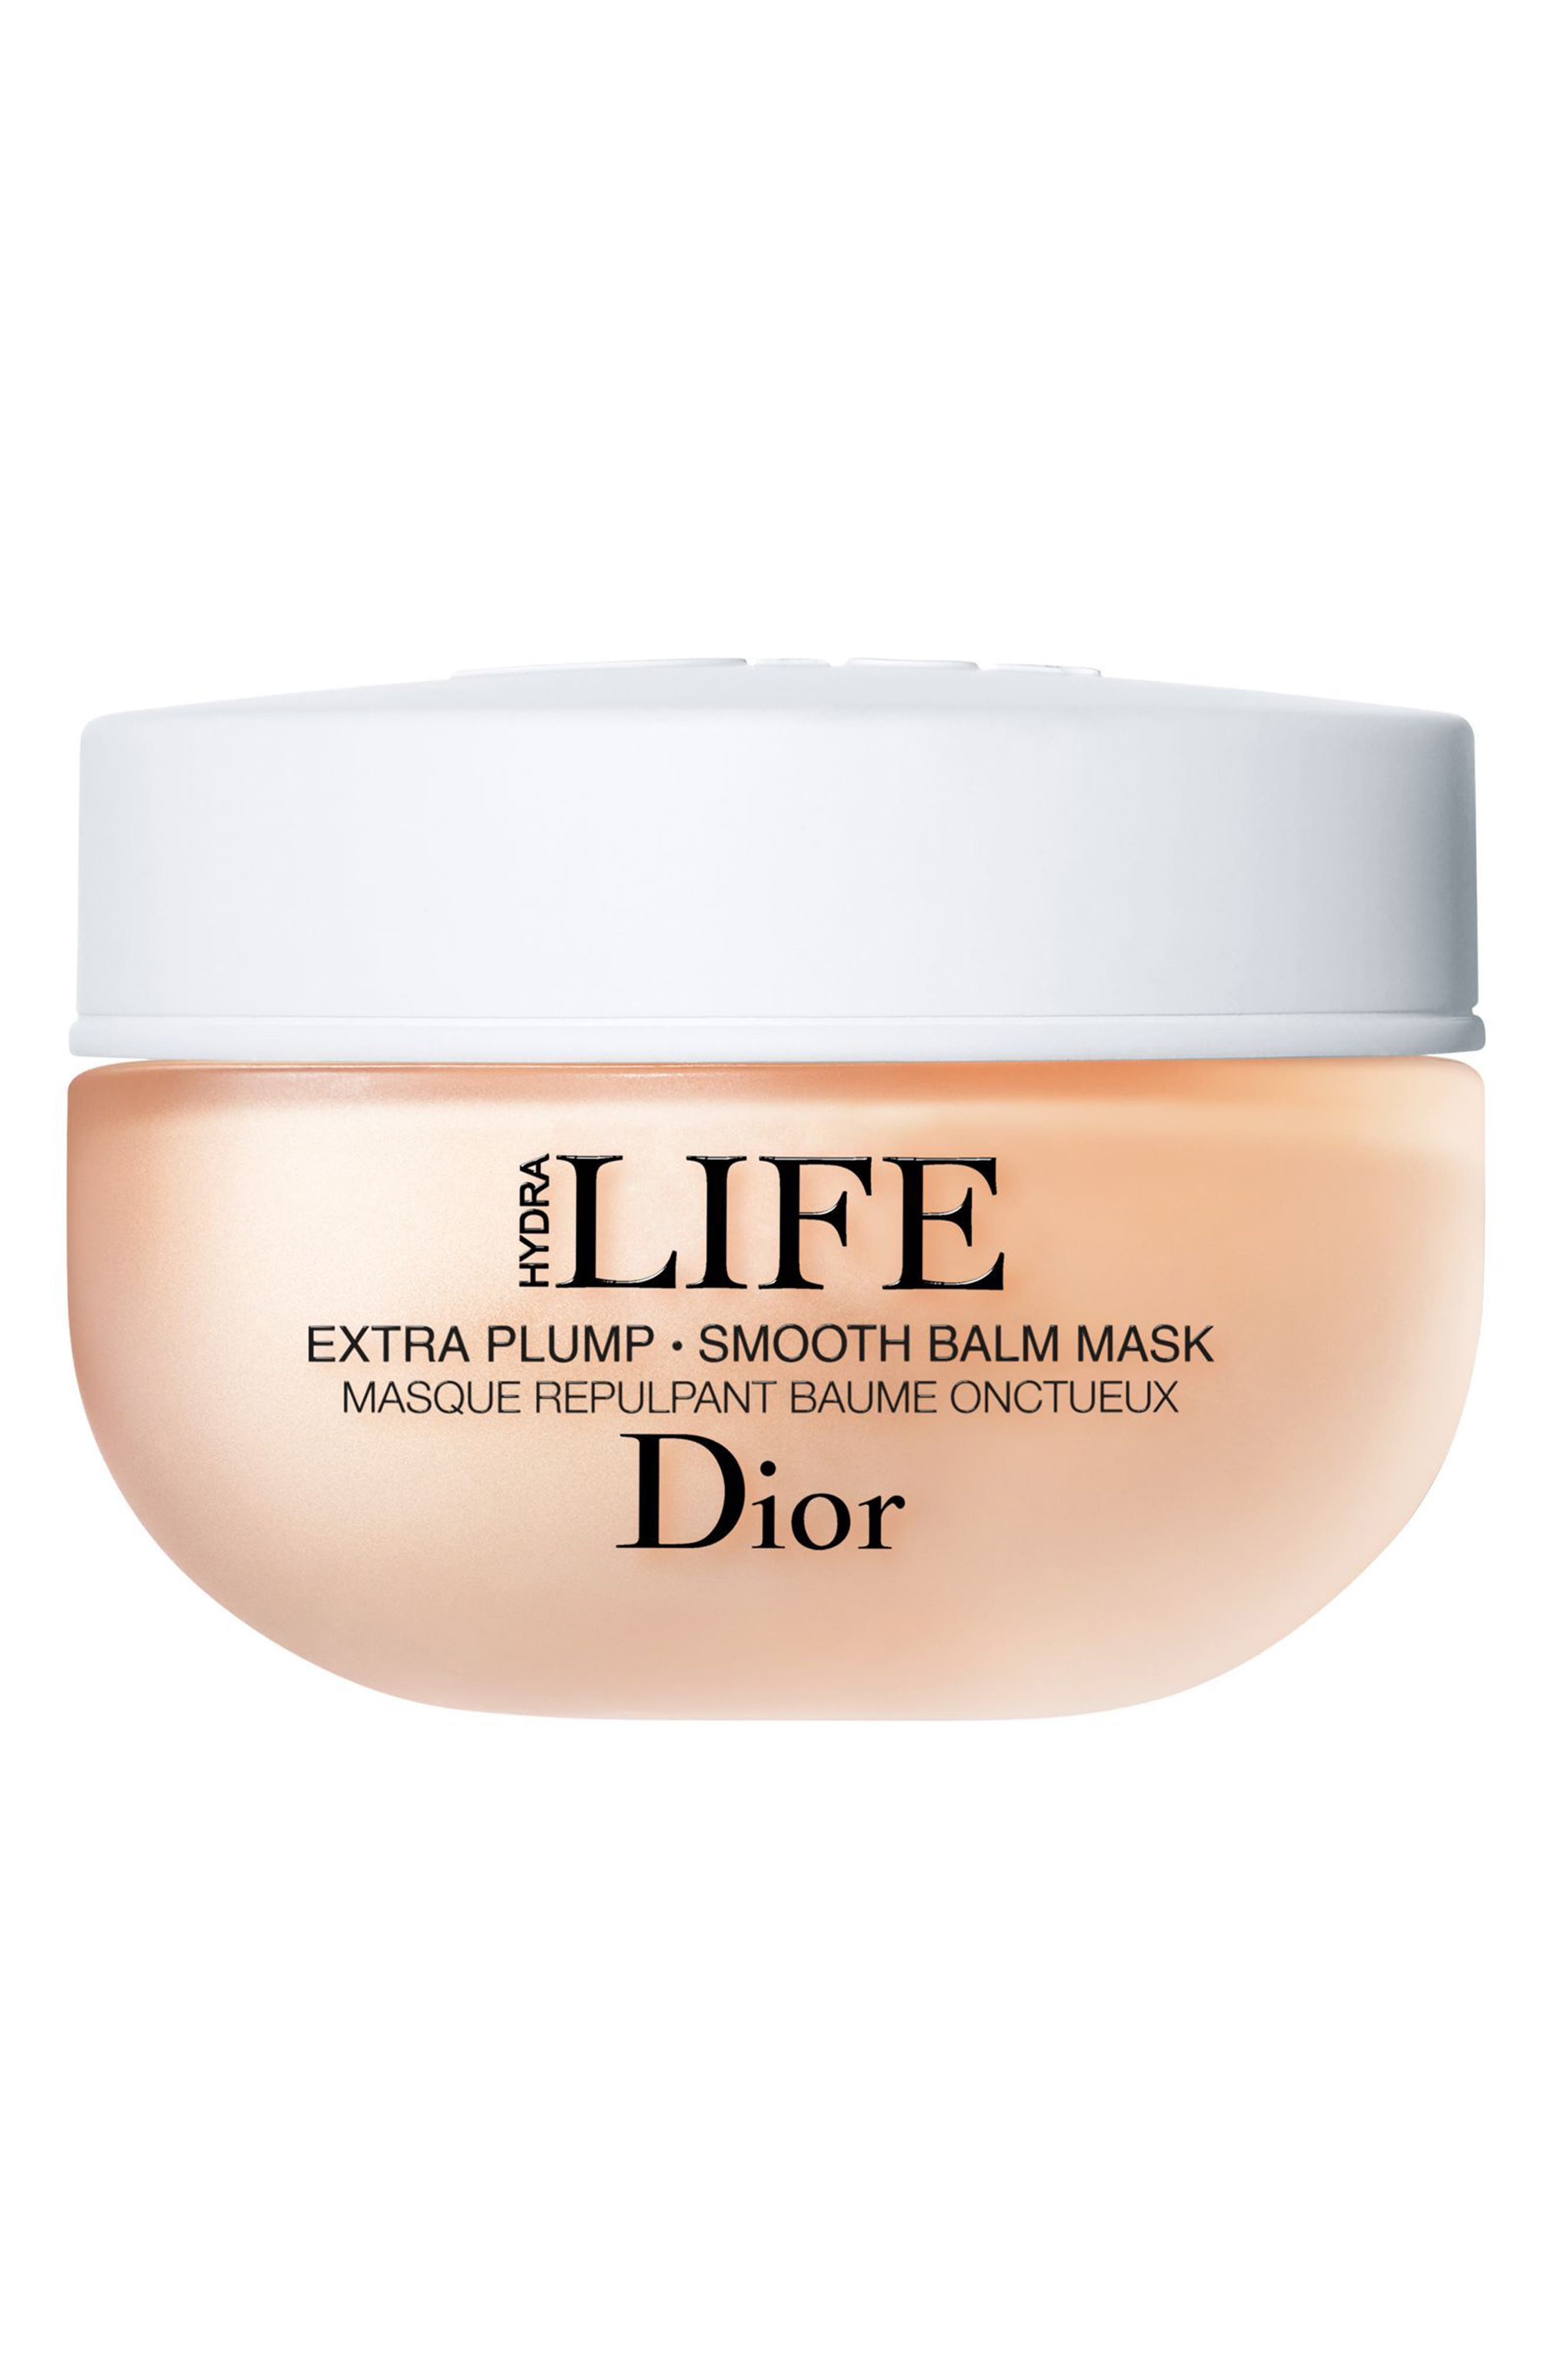 Hydra Life Extra Plump Smooth Balm Mask,                         Main,                         color, NO COLOR